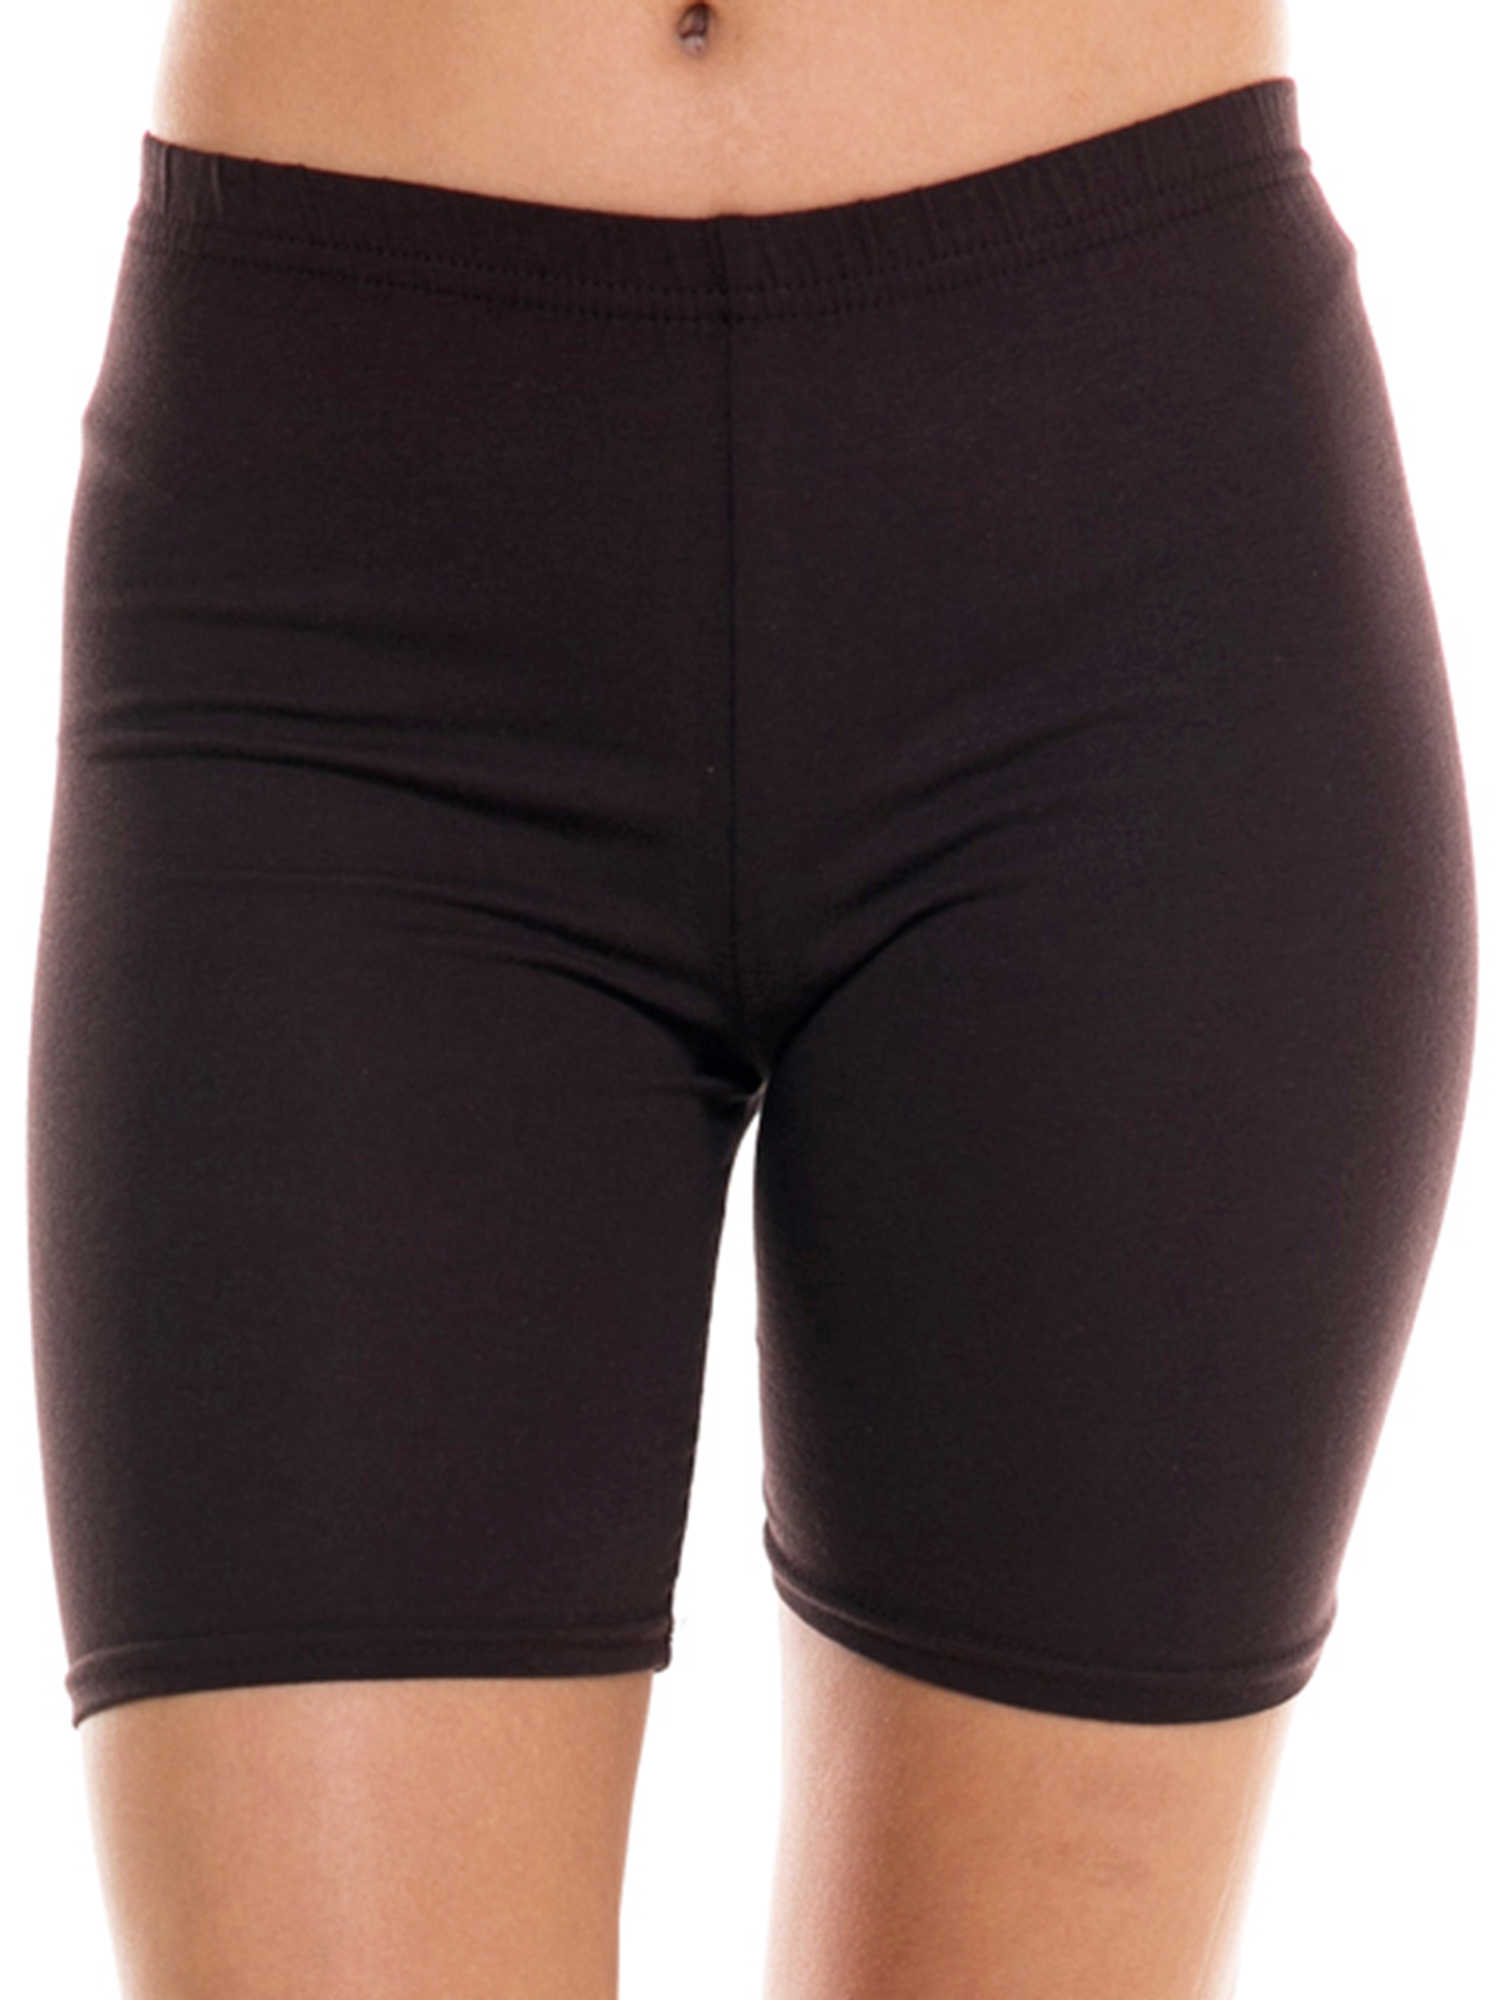 Ola Mari's Junior Size Solid Plain Cotton Biker Shorts